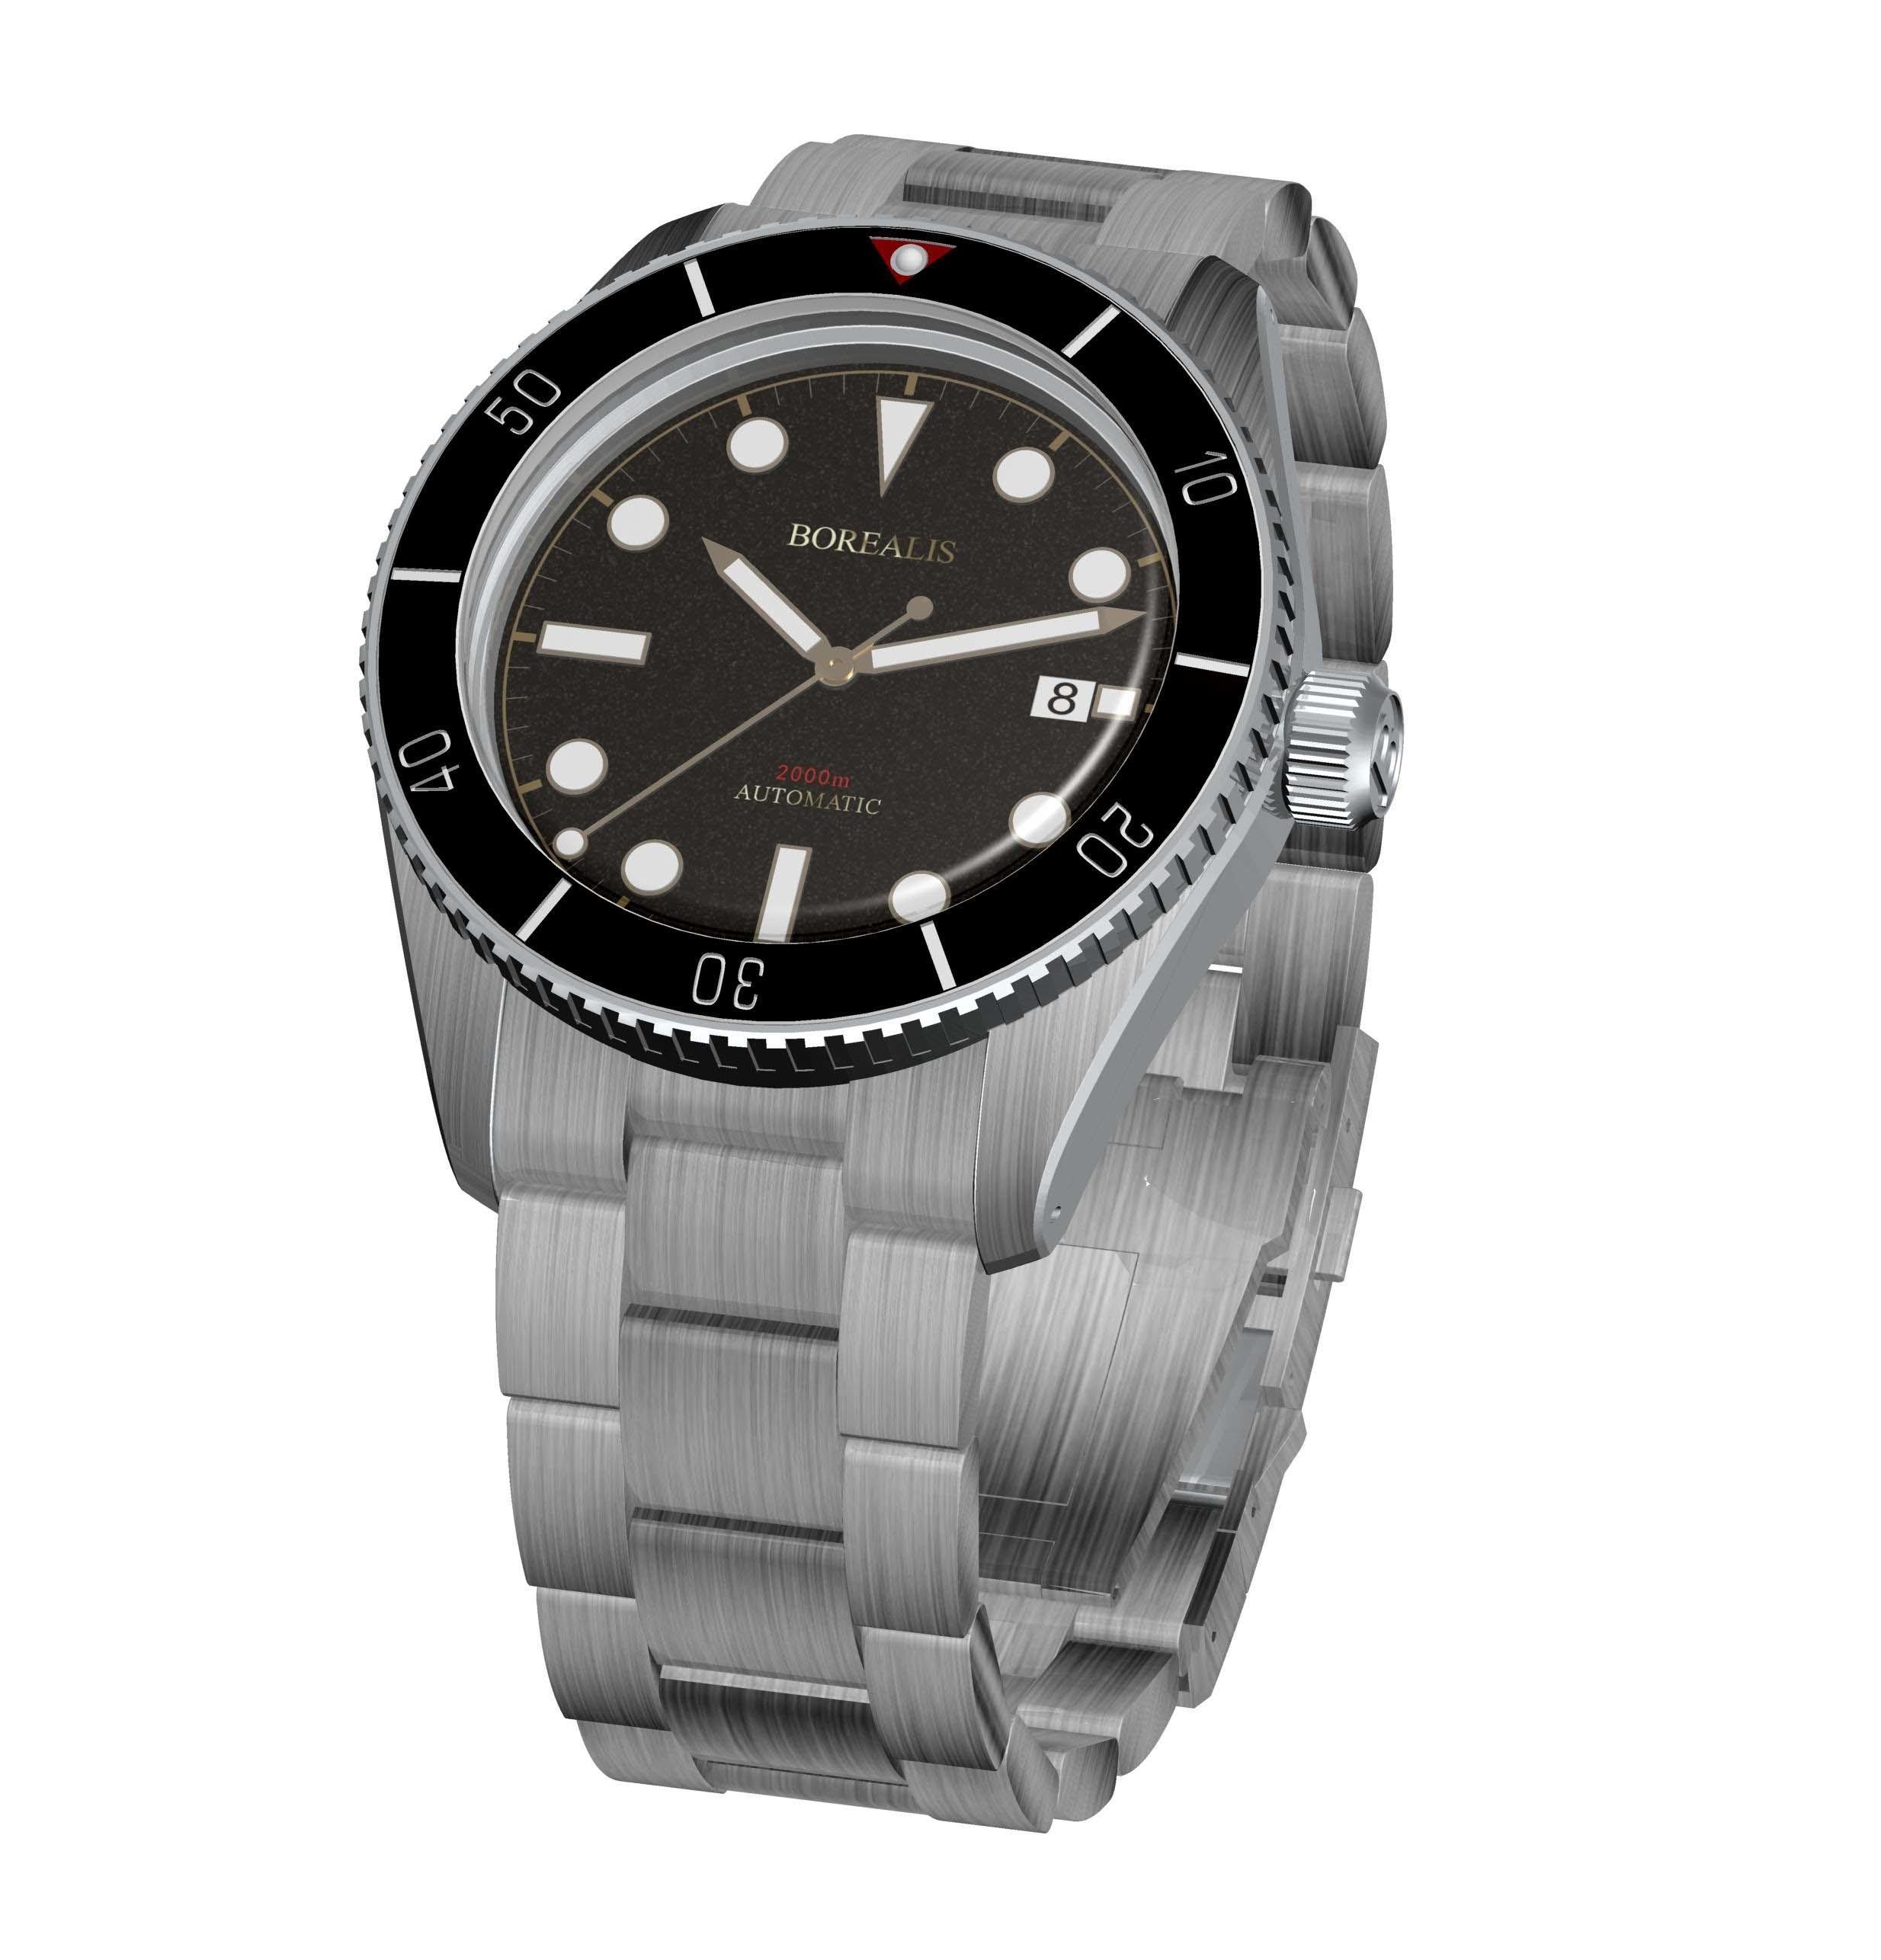 New product Duplicate    Borealis Bull Shark Automatic Diver Watch Date Miyota 9015 Ceramic Black Bezel Black Dial